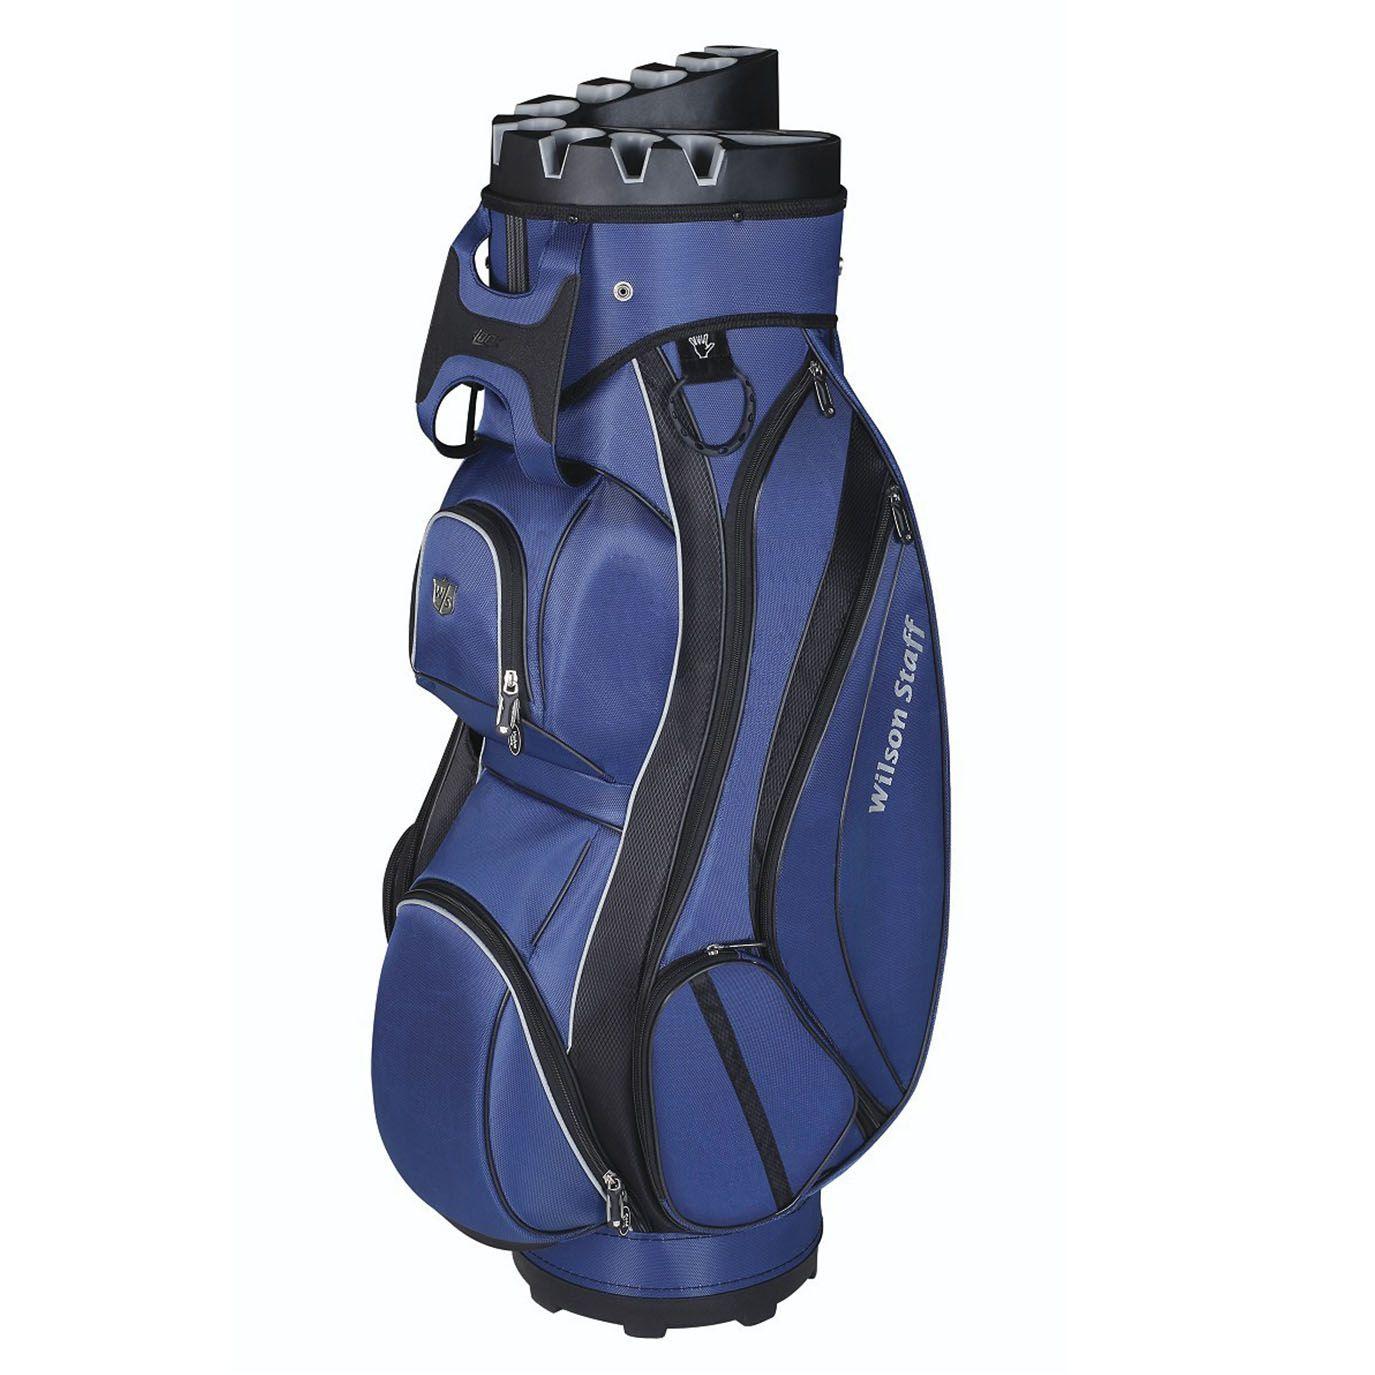 Golf Bags For Sale >> Wilson Staff I-Lock Golf Cart Bag 2014 - Sweatband.com